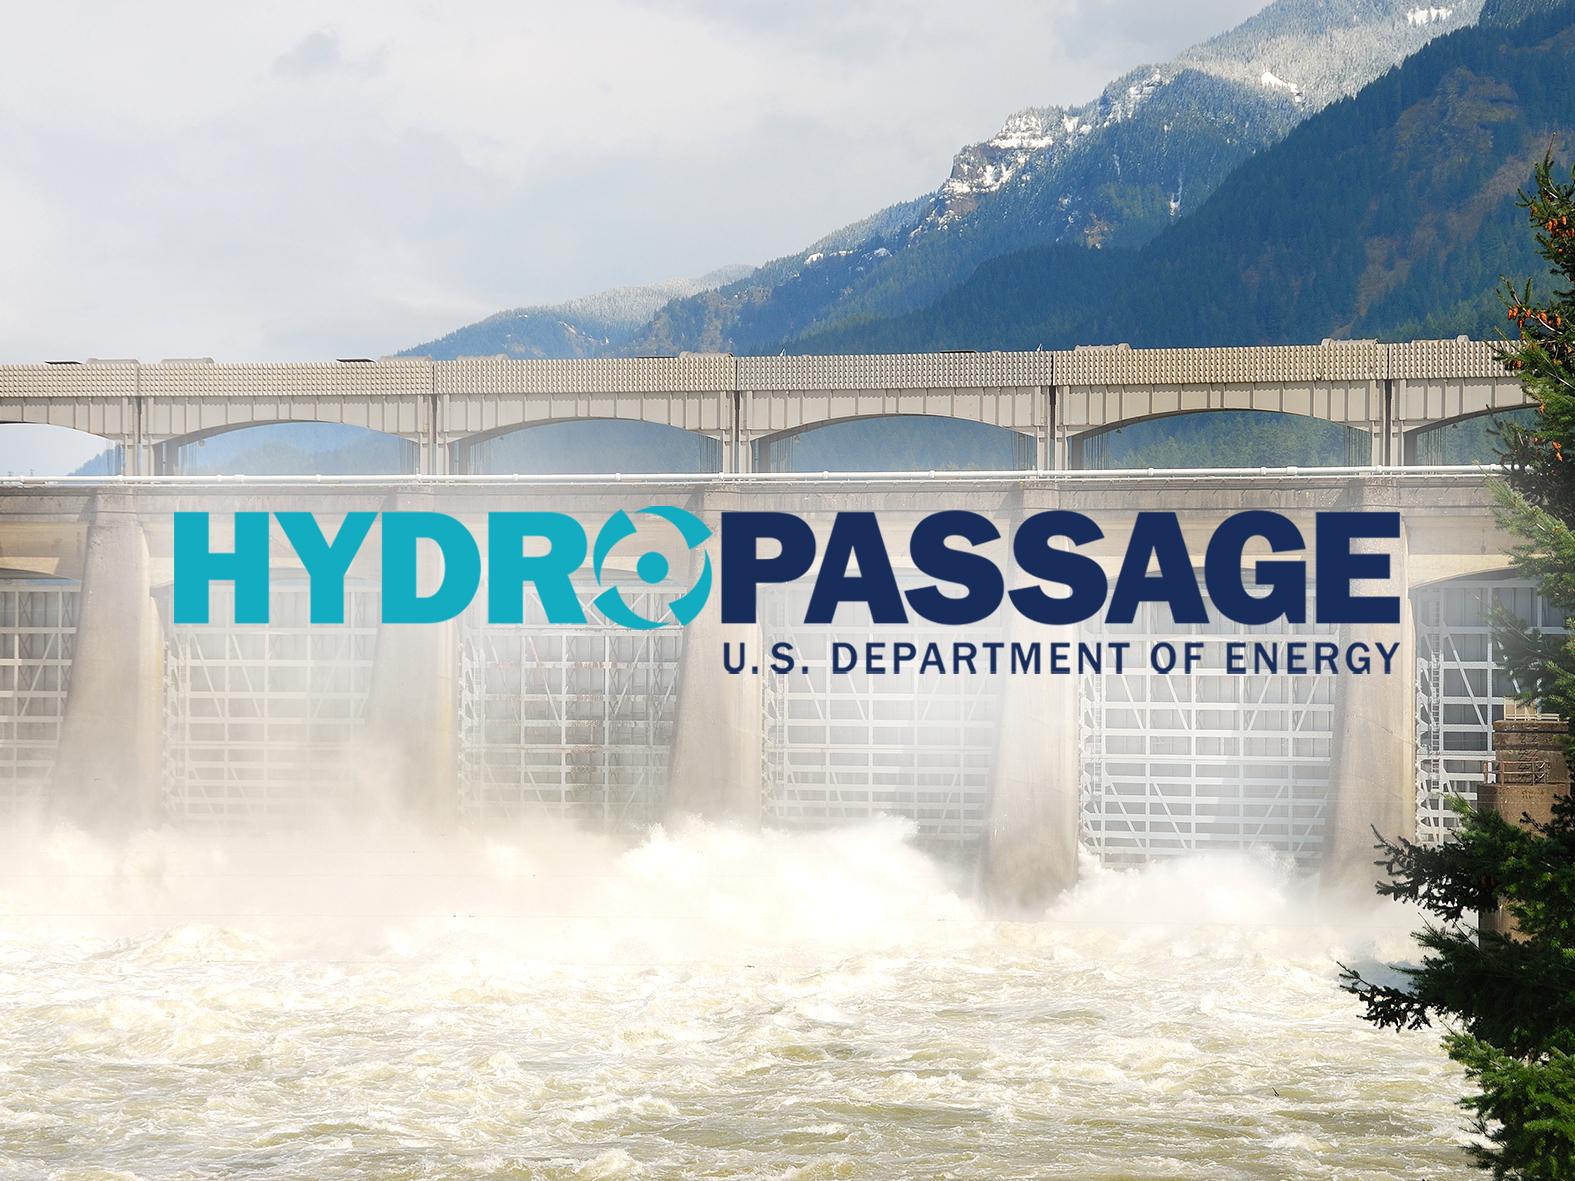 HydroPASSAGE project